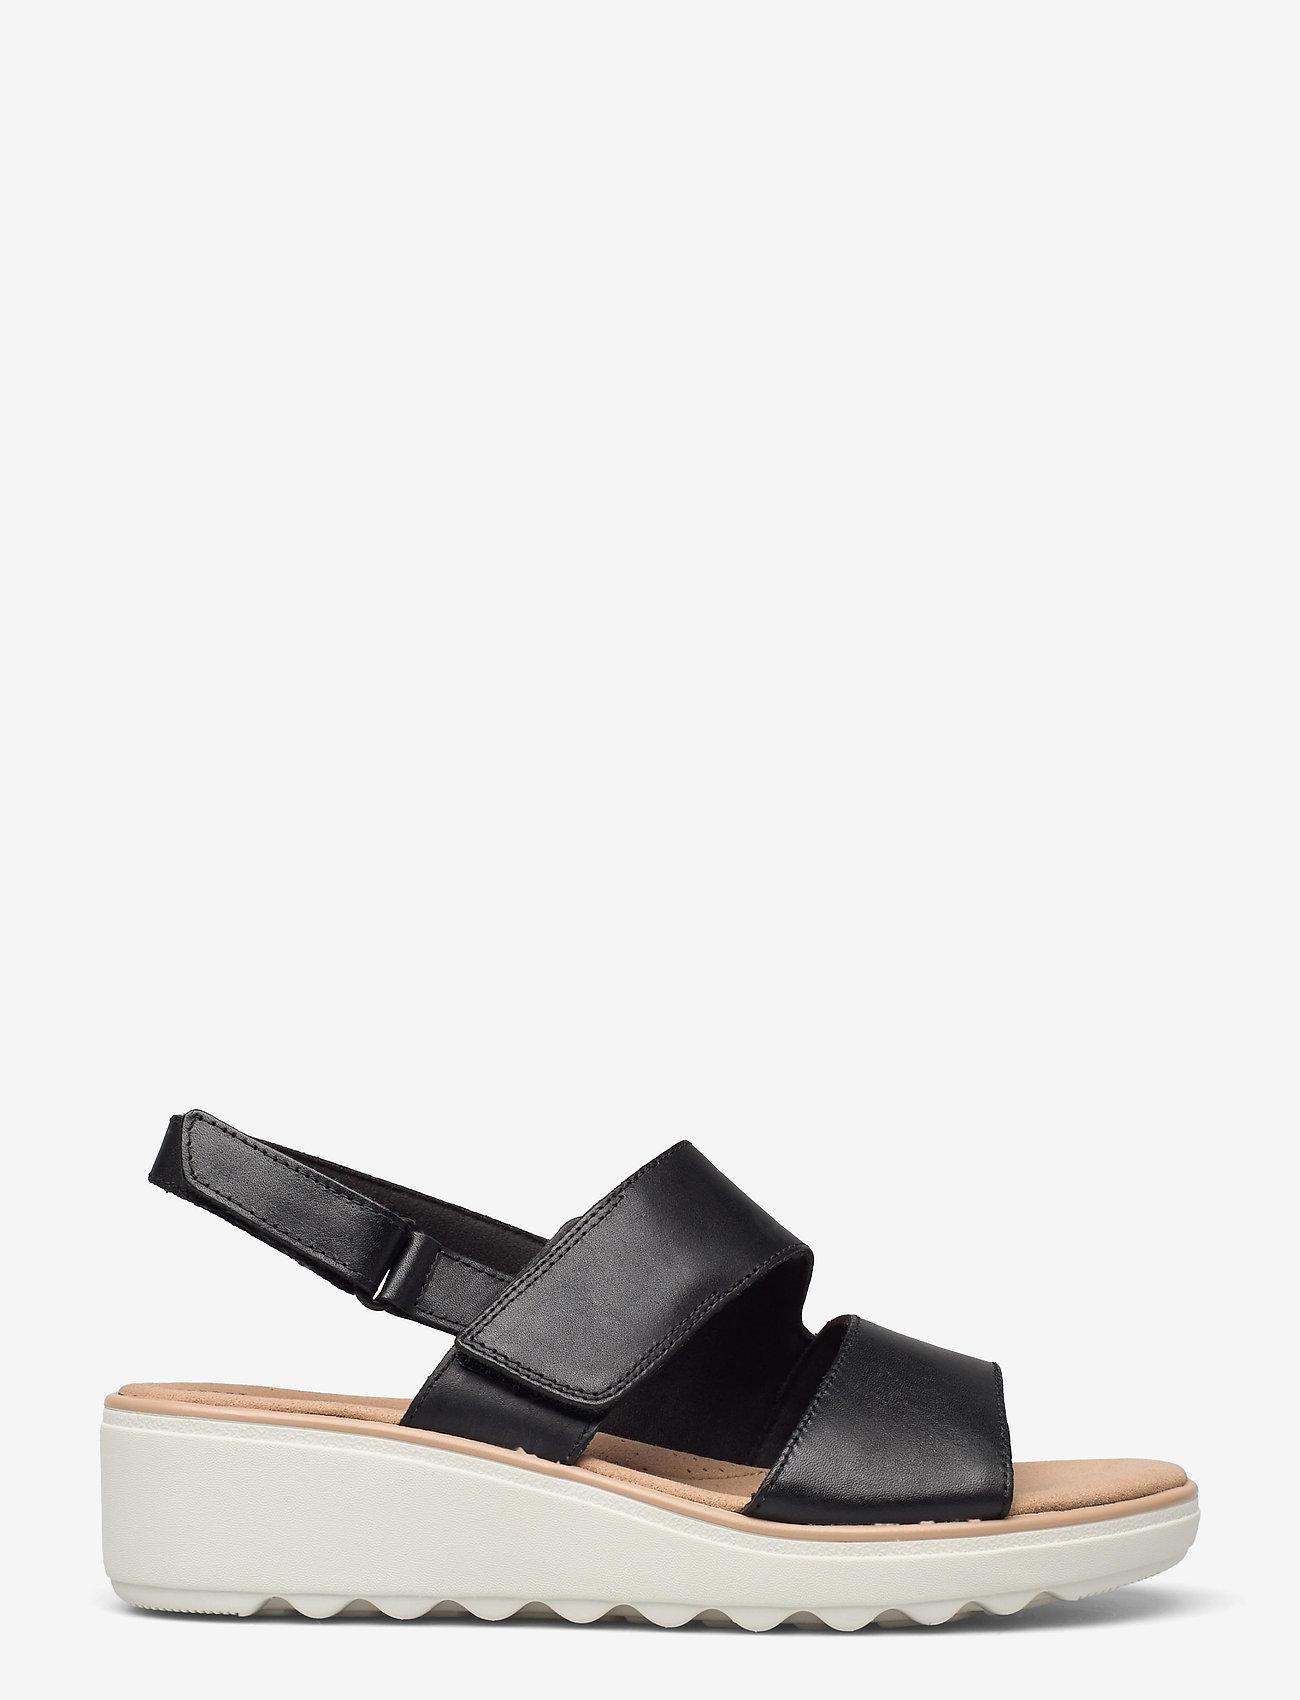 Clarks - Jillian Pearl - sandales - black leather - 1